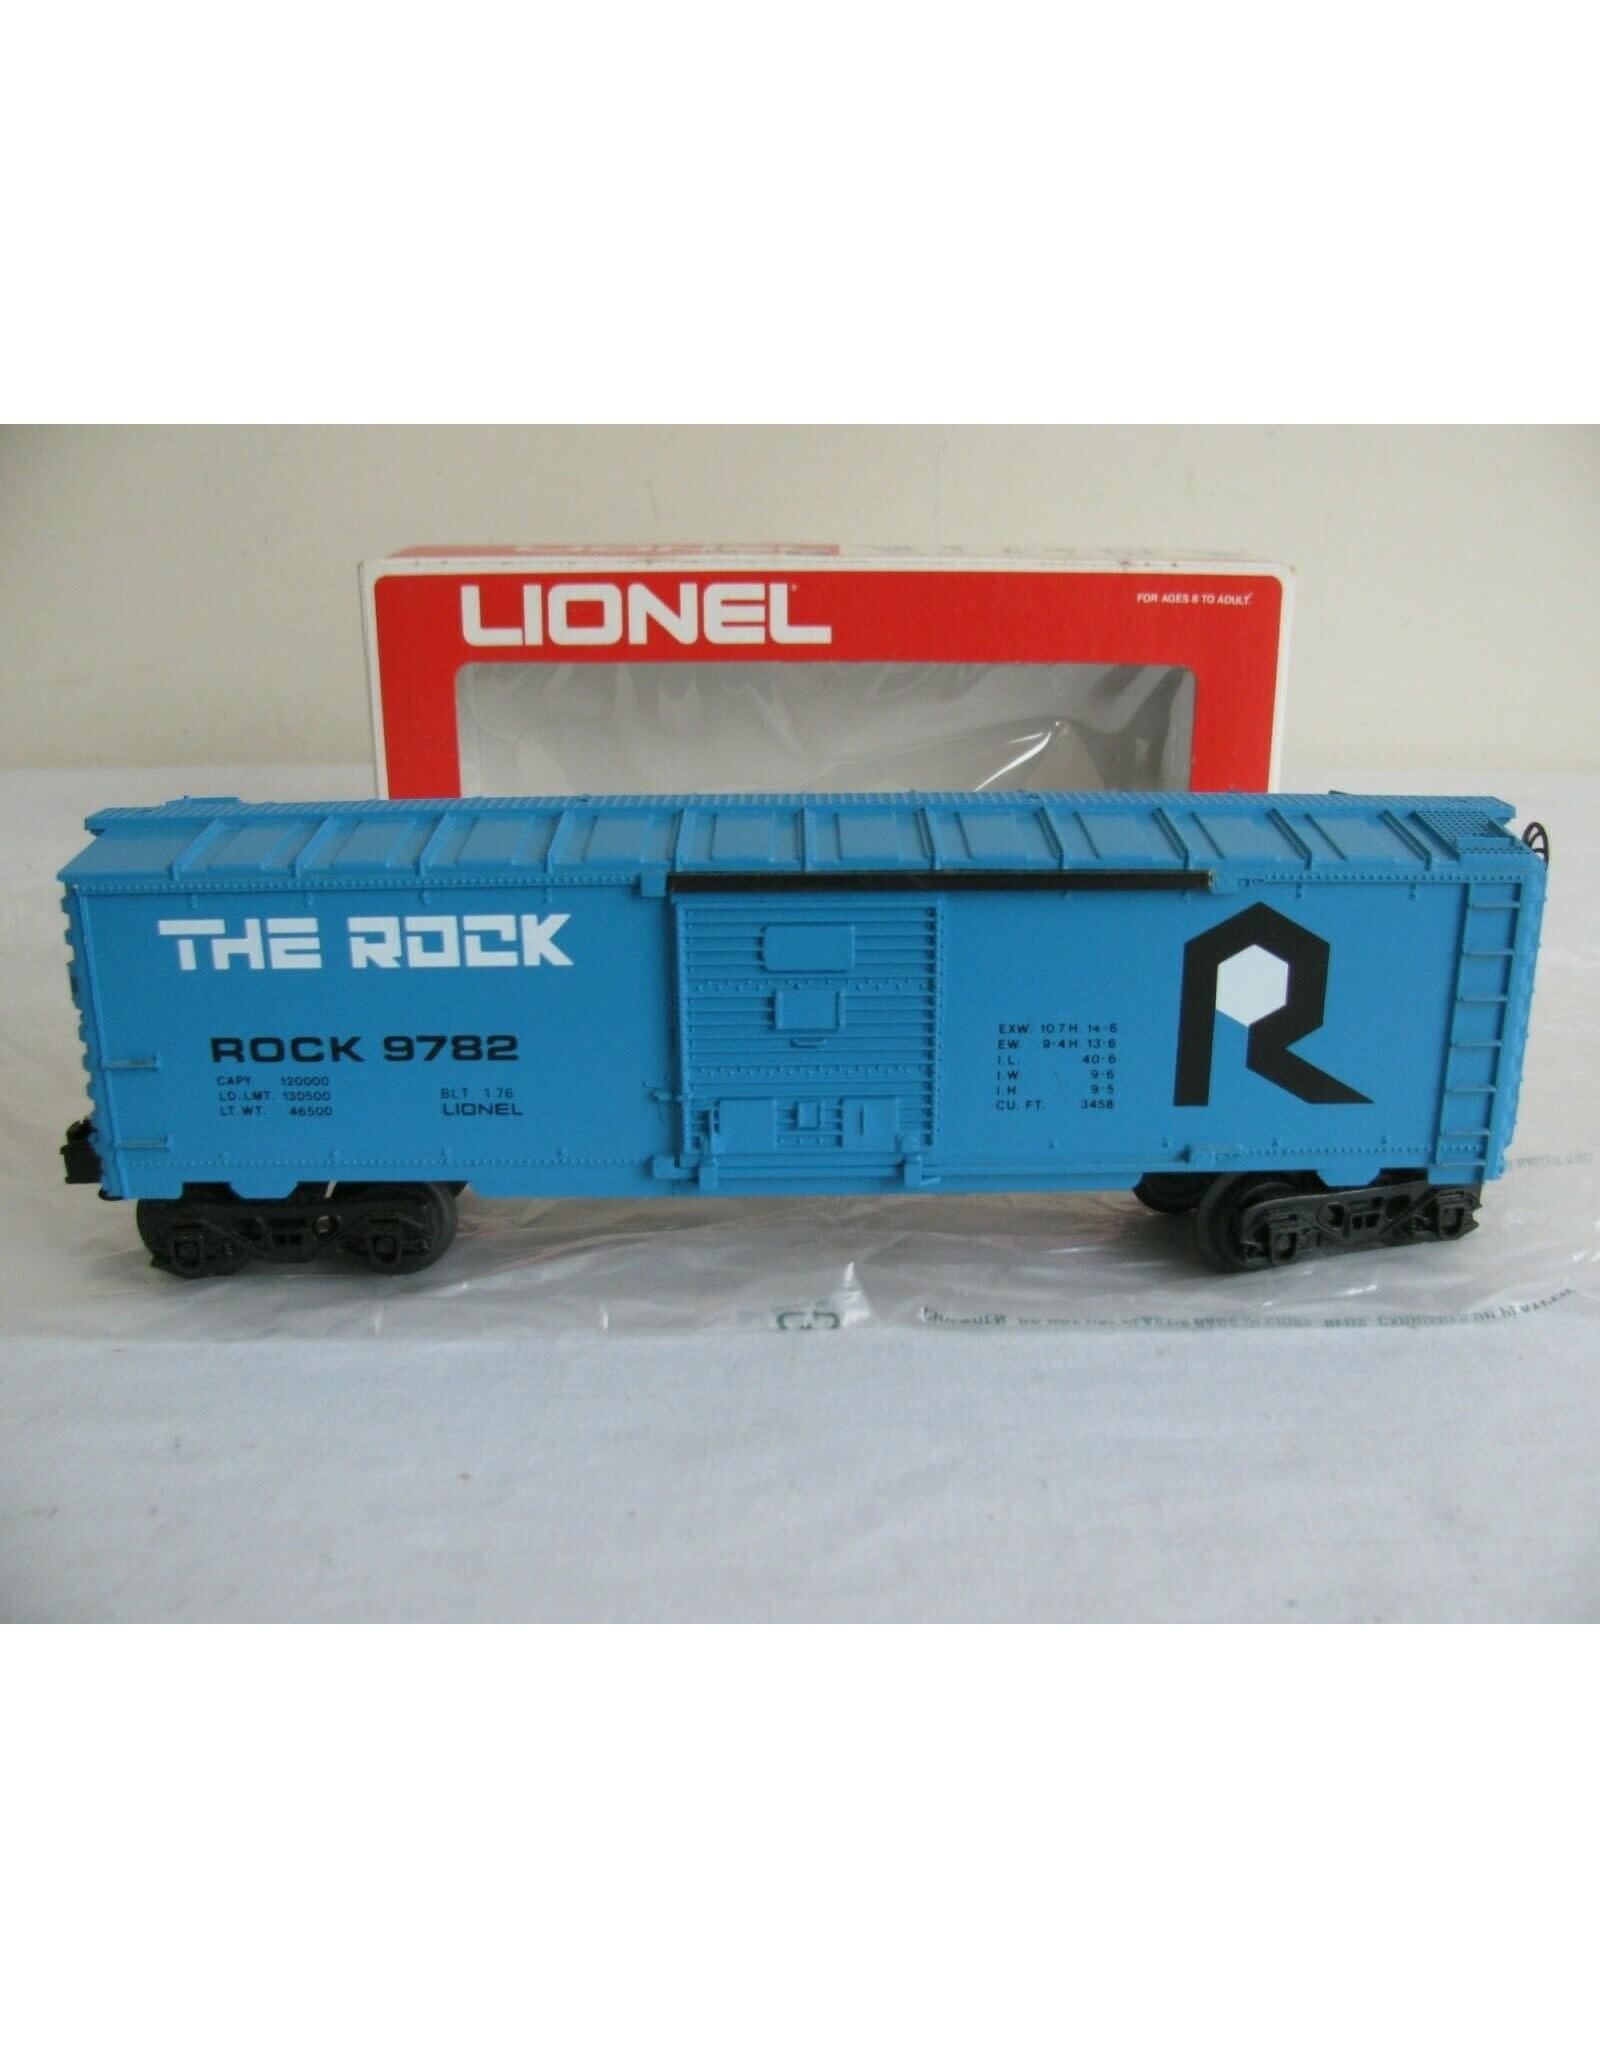 Lionel Boxcar The Rock 9782